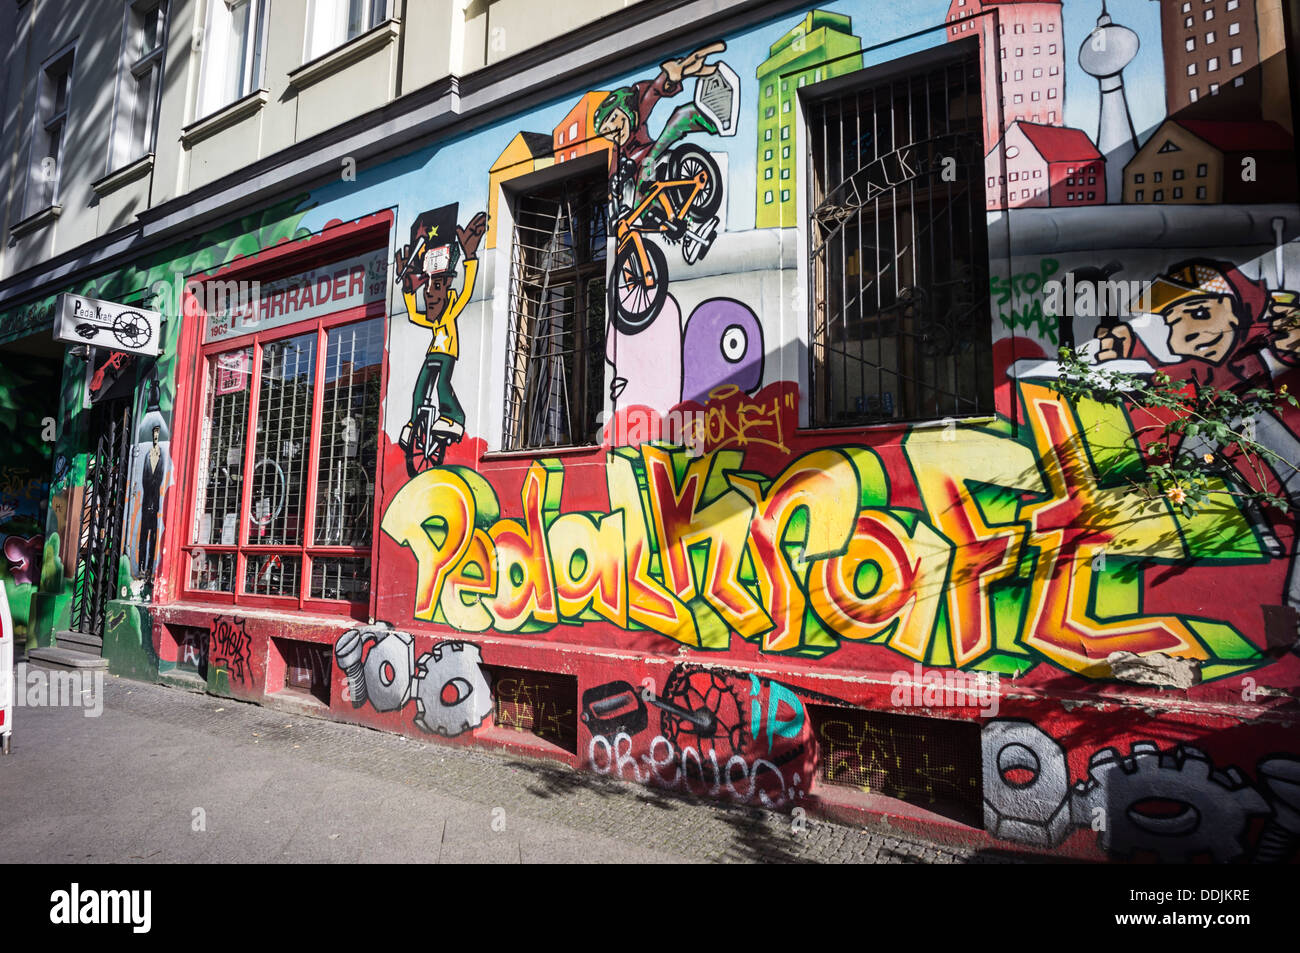 Mural, Graffiti, ciclo de tienda, Kreuzberg, Berlín Imagen De Stock